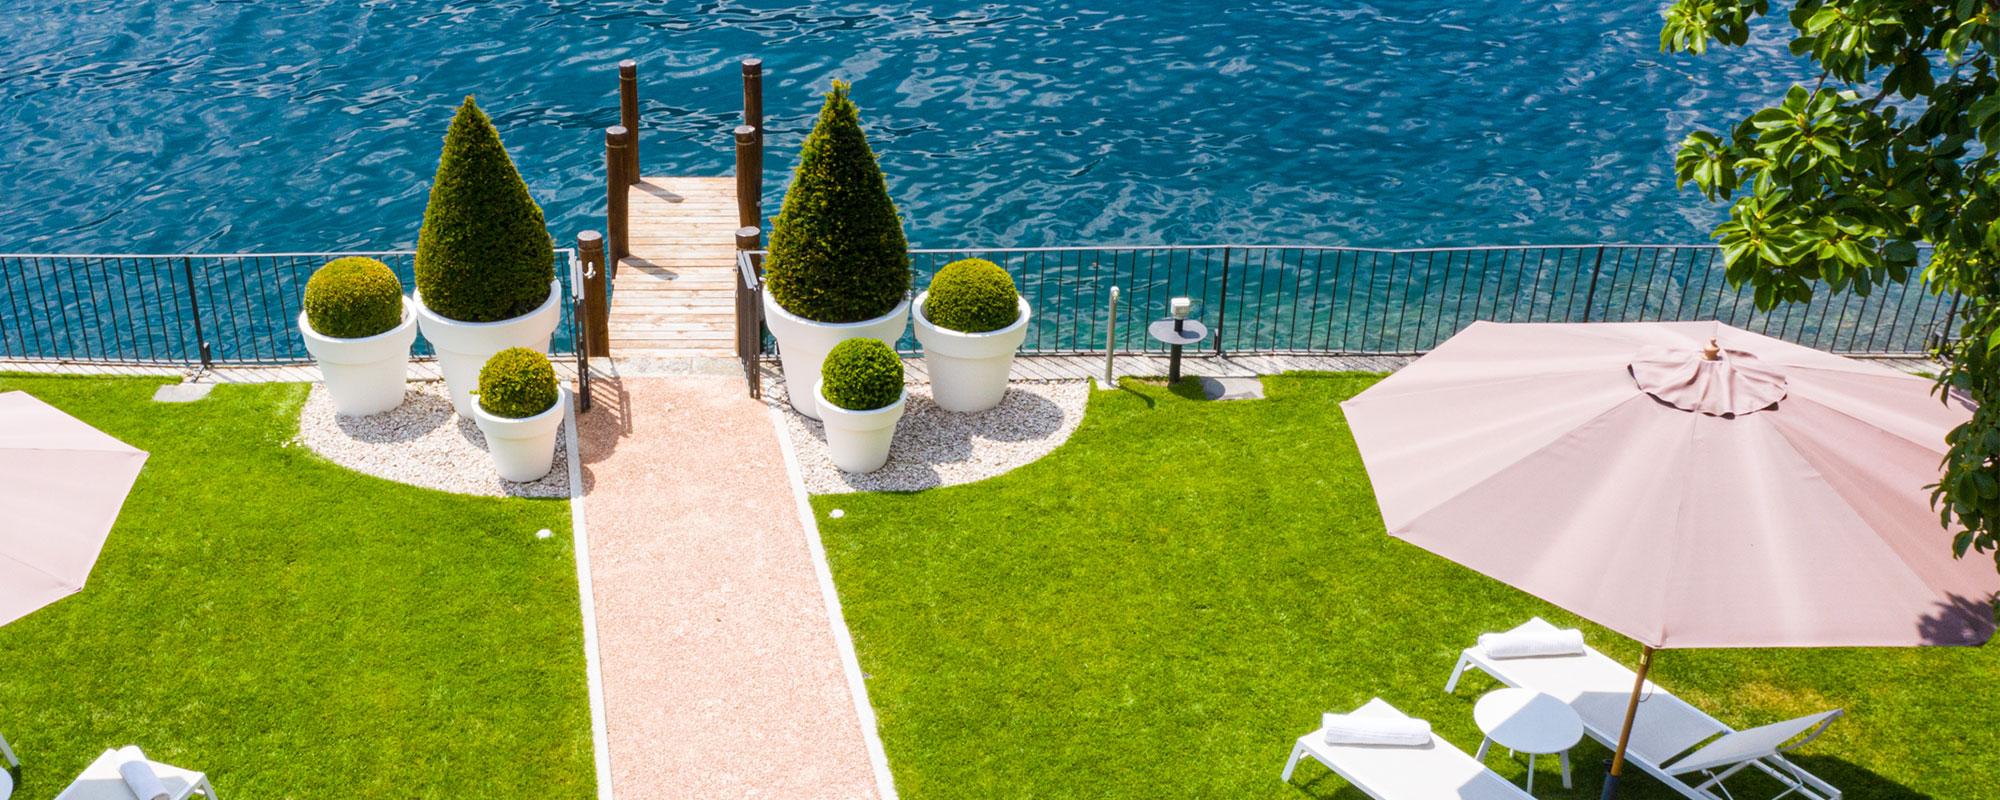 Bifora65_lago d'Orta_Orta_lake_lake_garden